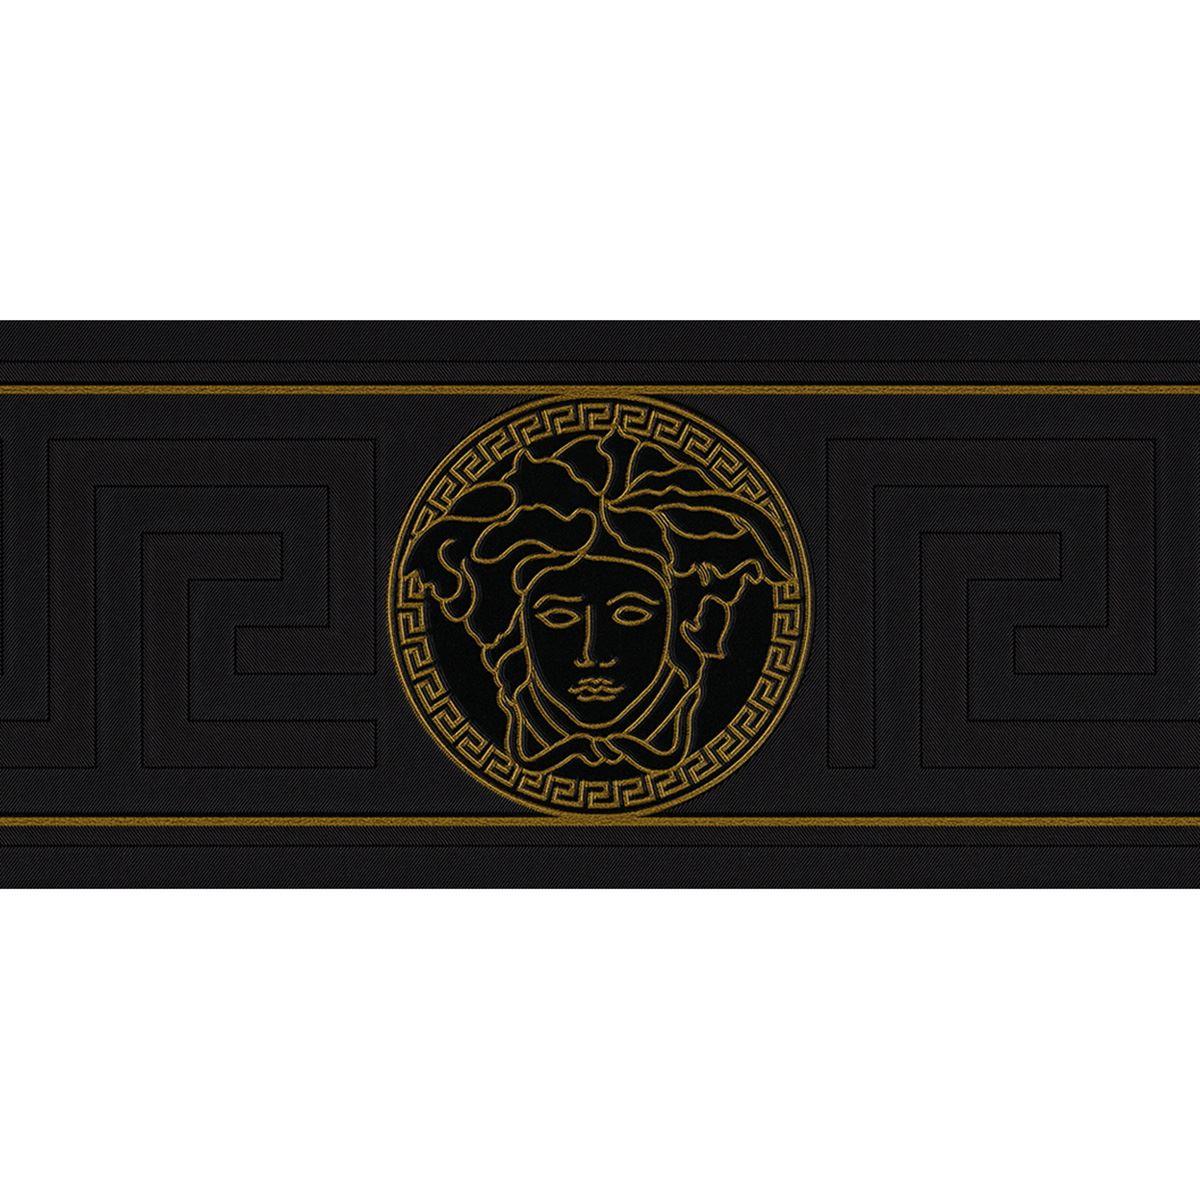 AS Creation Versace Greek Key Medusa Gold Border Wallpaper 93522-2